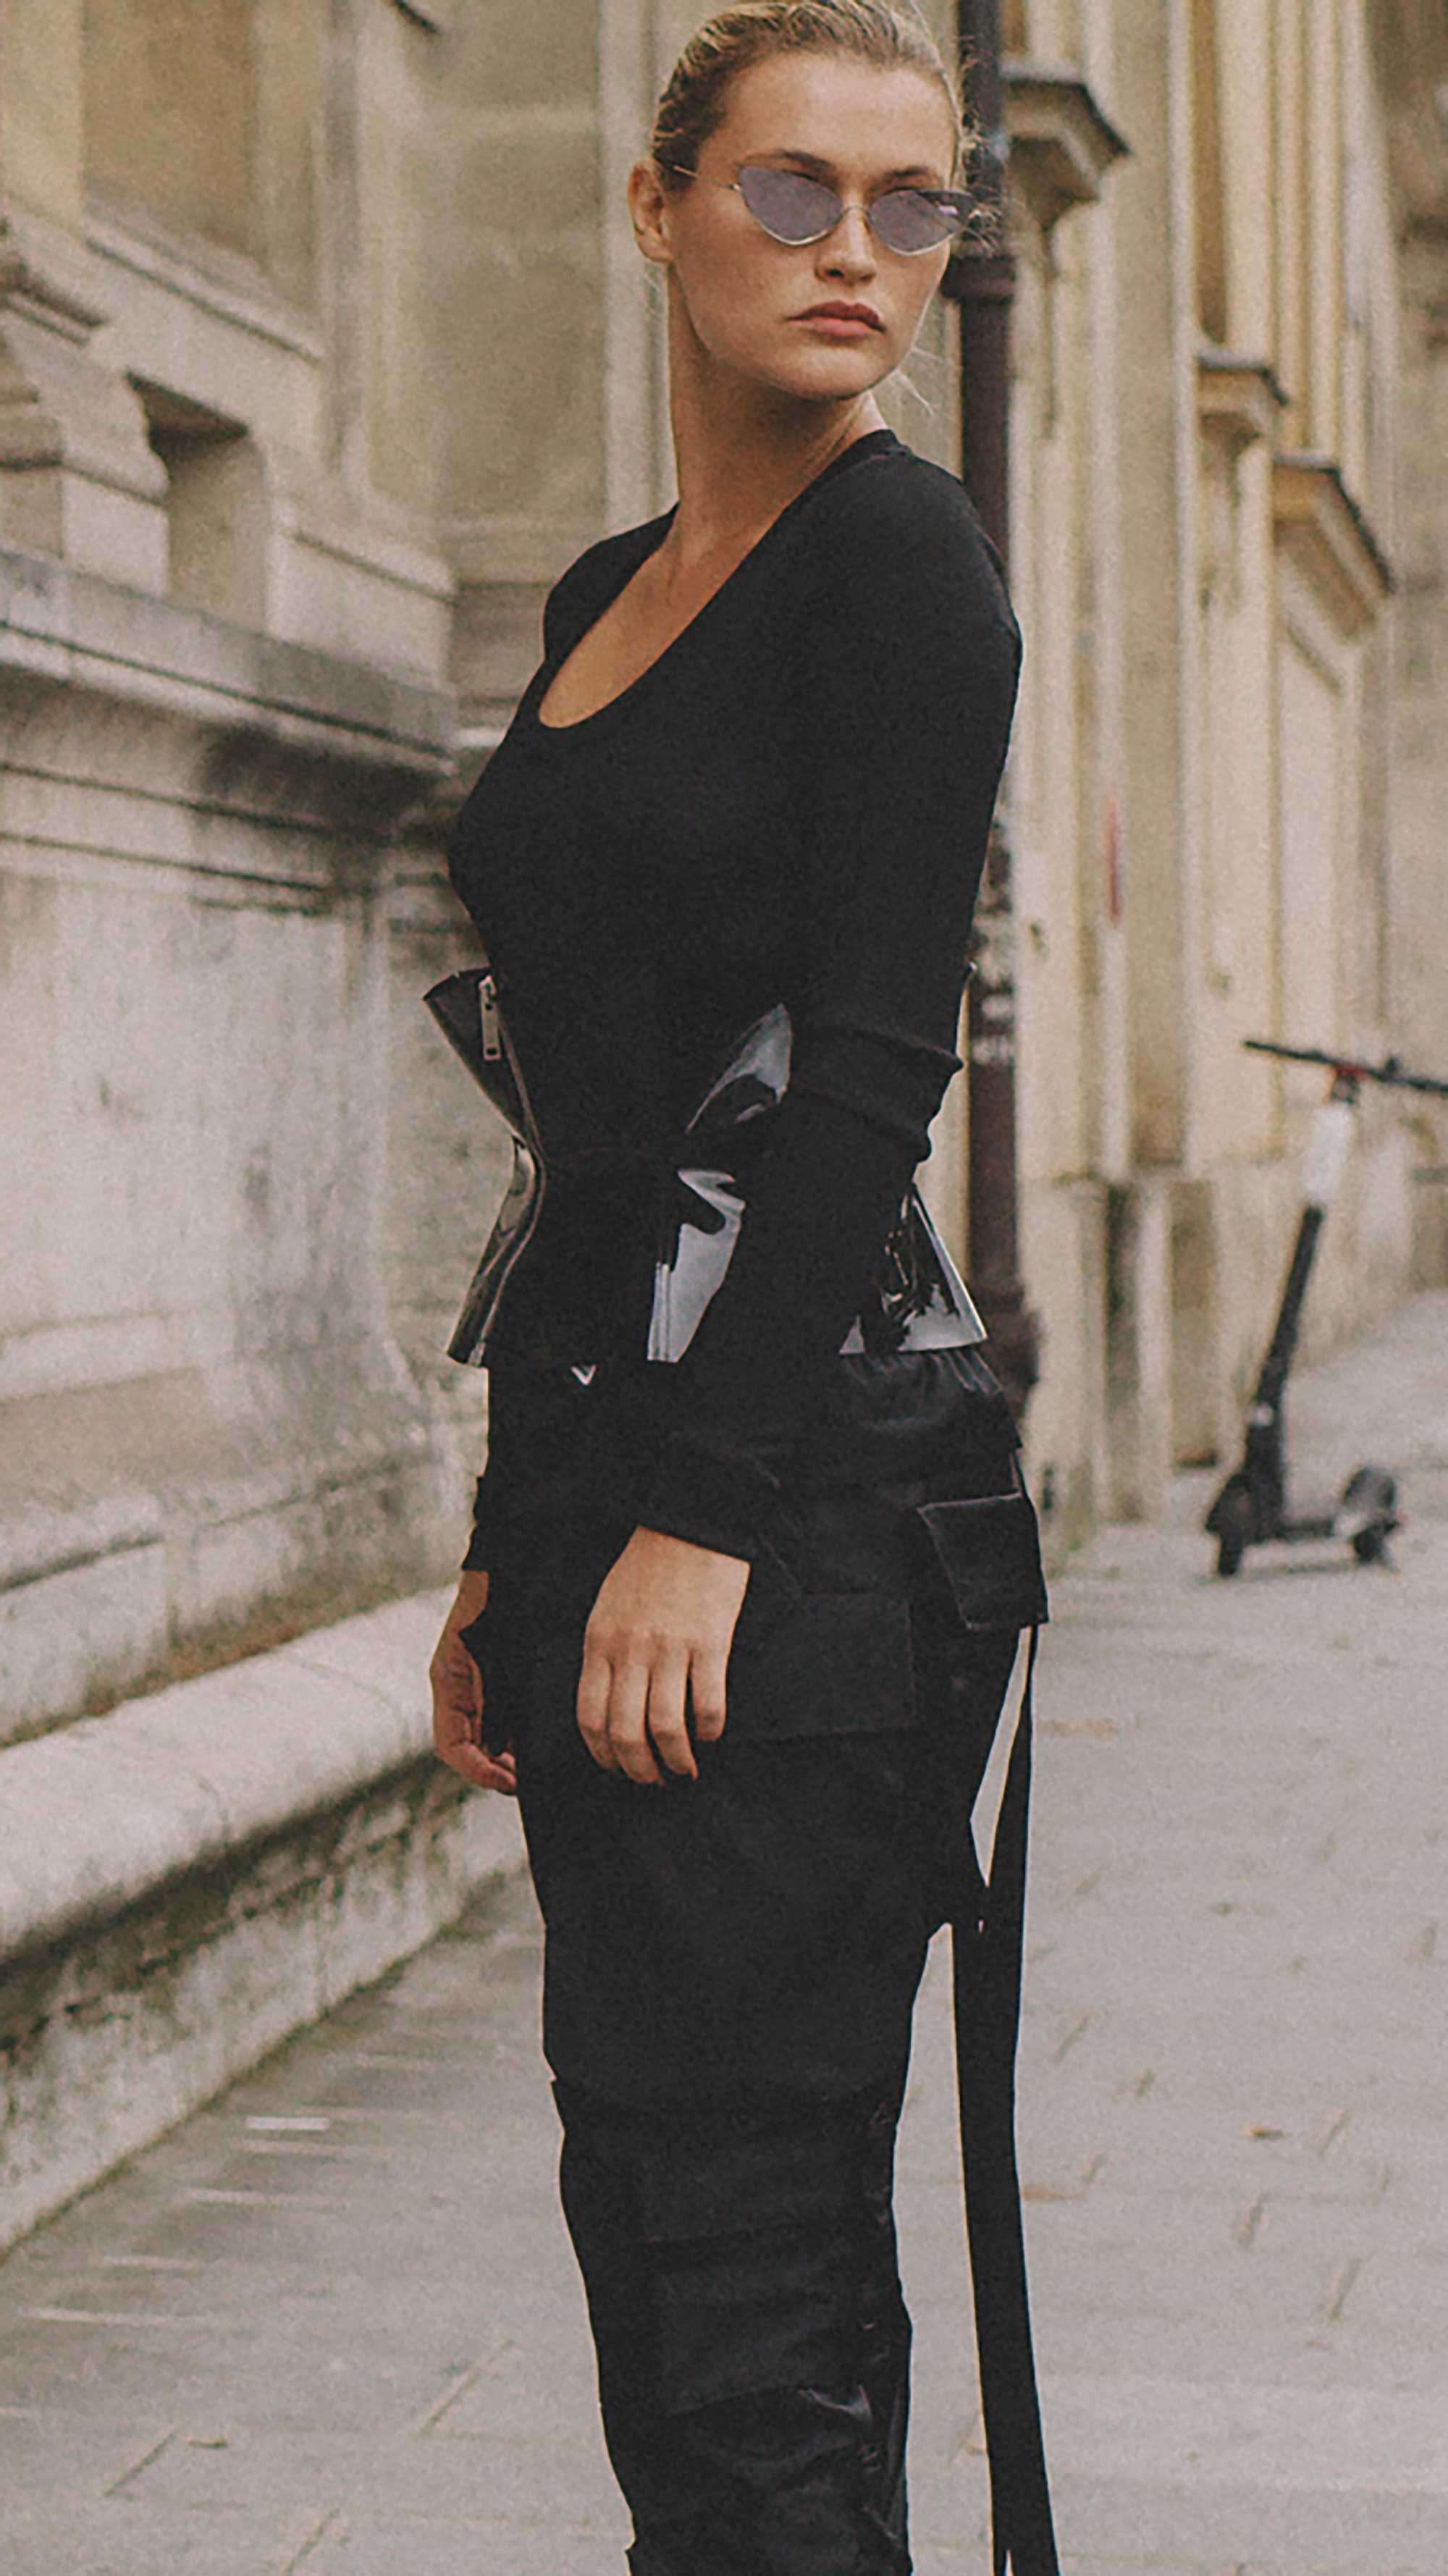 Best outfits of Paris Fashion Week street style 2019 day two PFW SS20 Photo by @J2martinez Jose J. Martinez -64.jpg